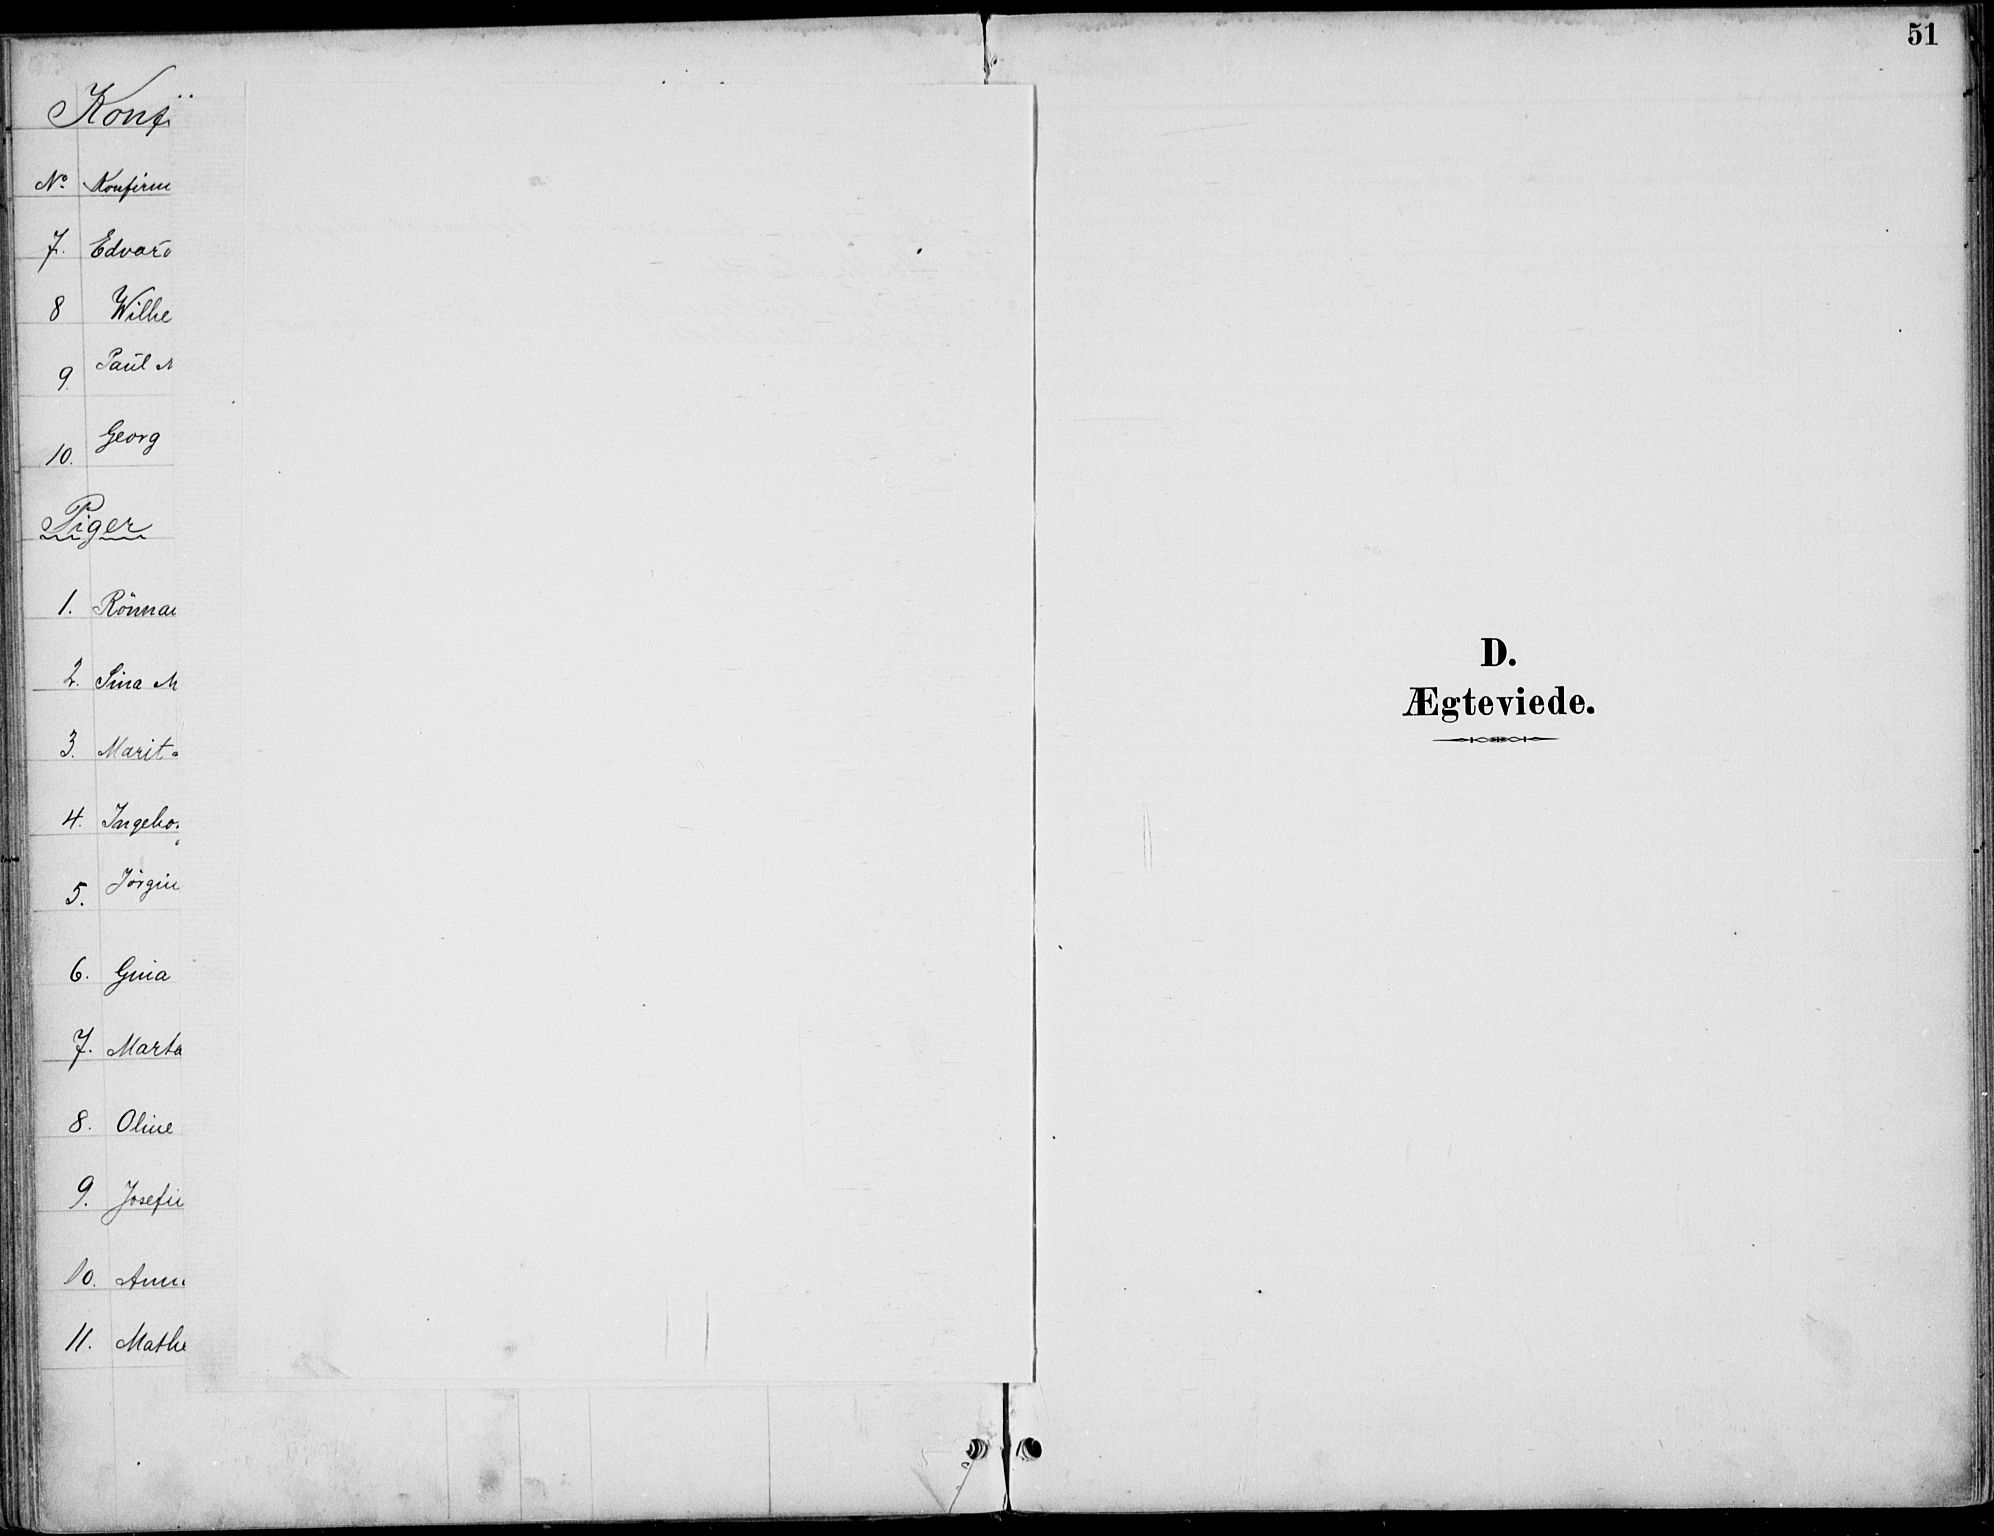 SAH, Østre Gausdal prestekontor, Ministerialbok nr. 3, 1887-1901, s. 51